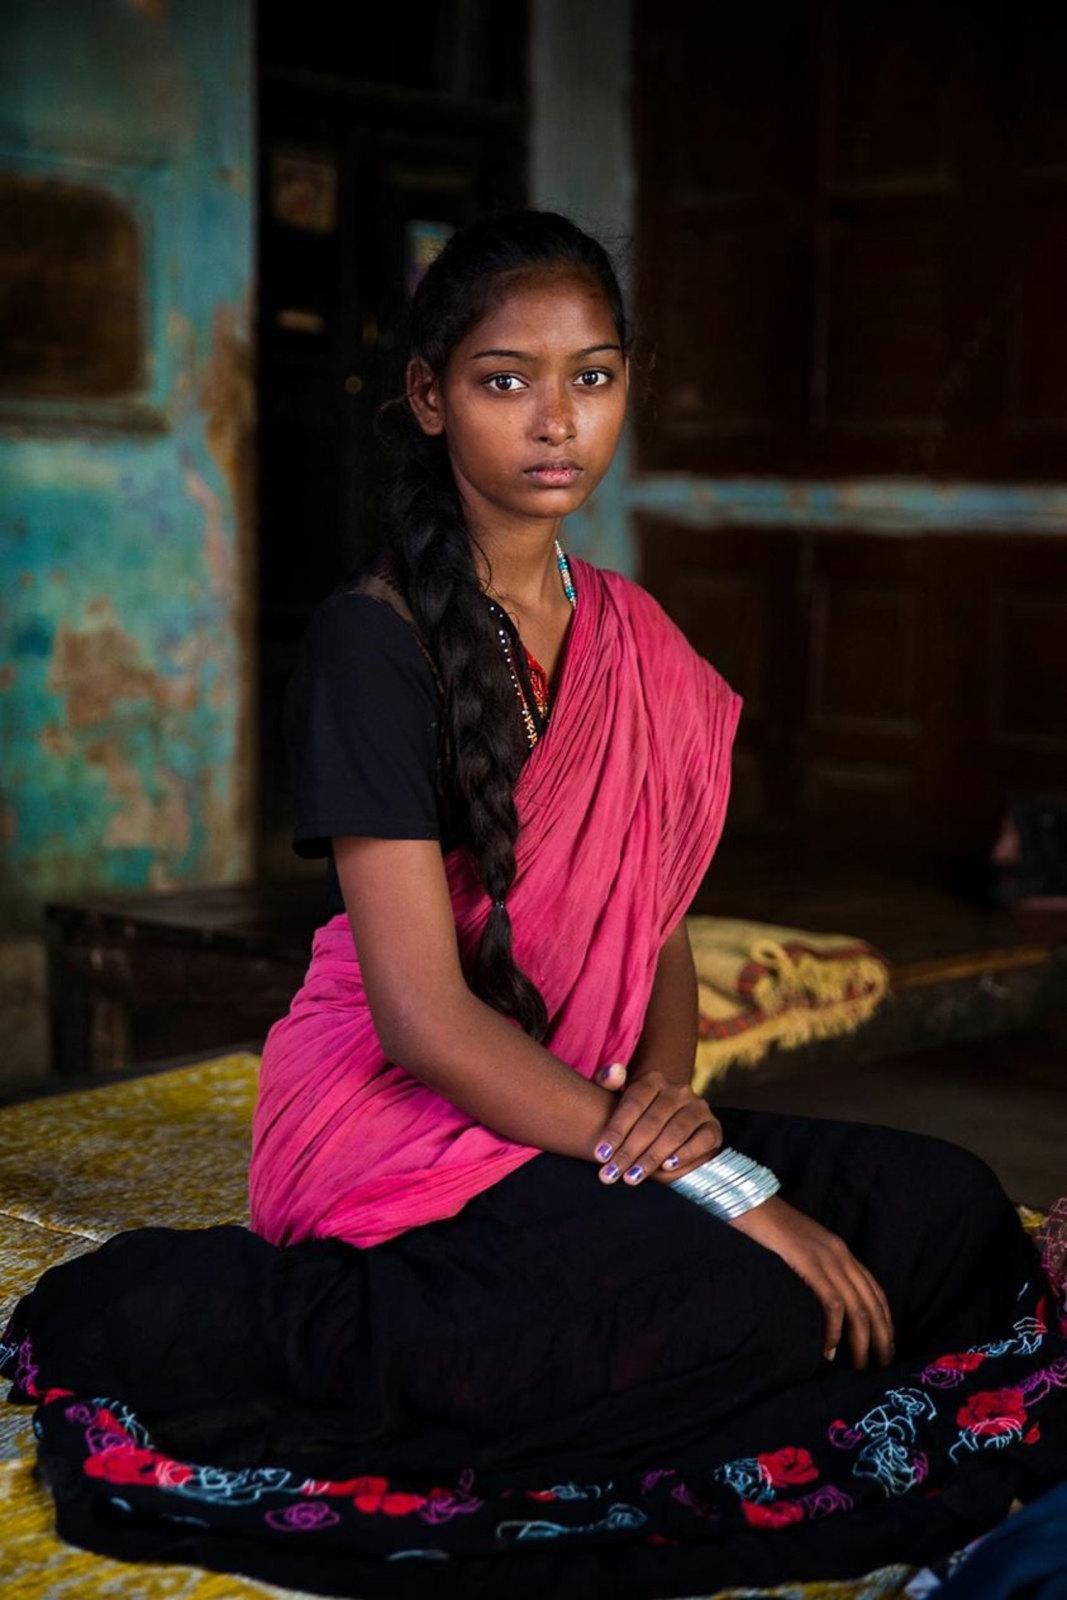 Portrait de femme, Varanasi India Photo: Mihaela Noroc